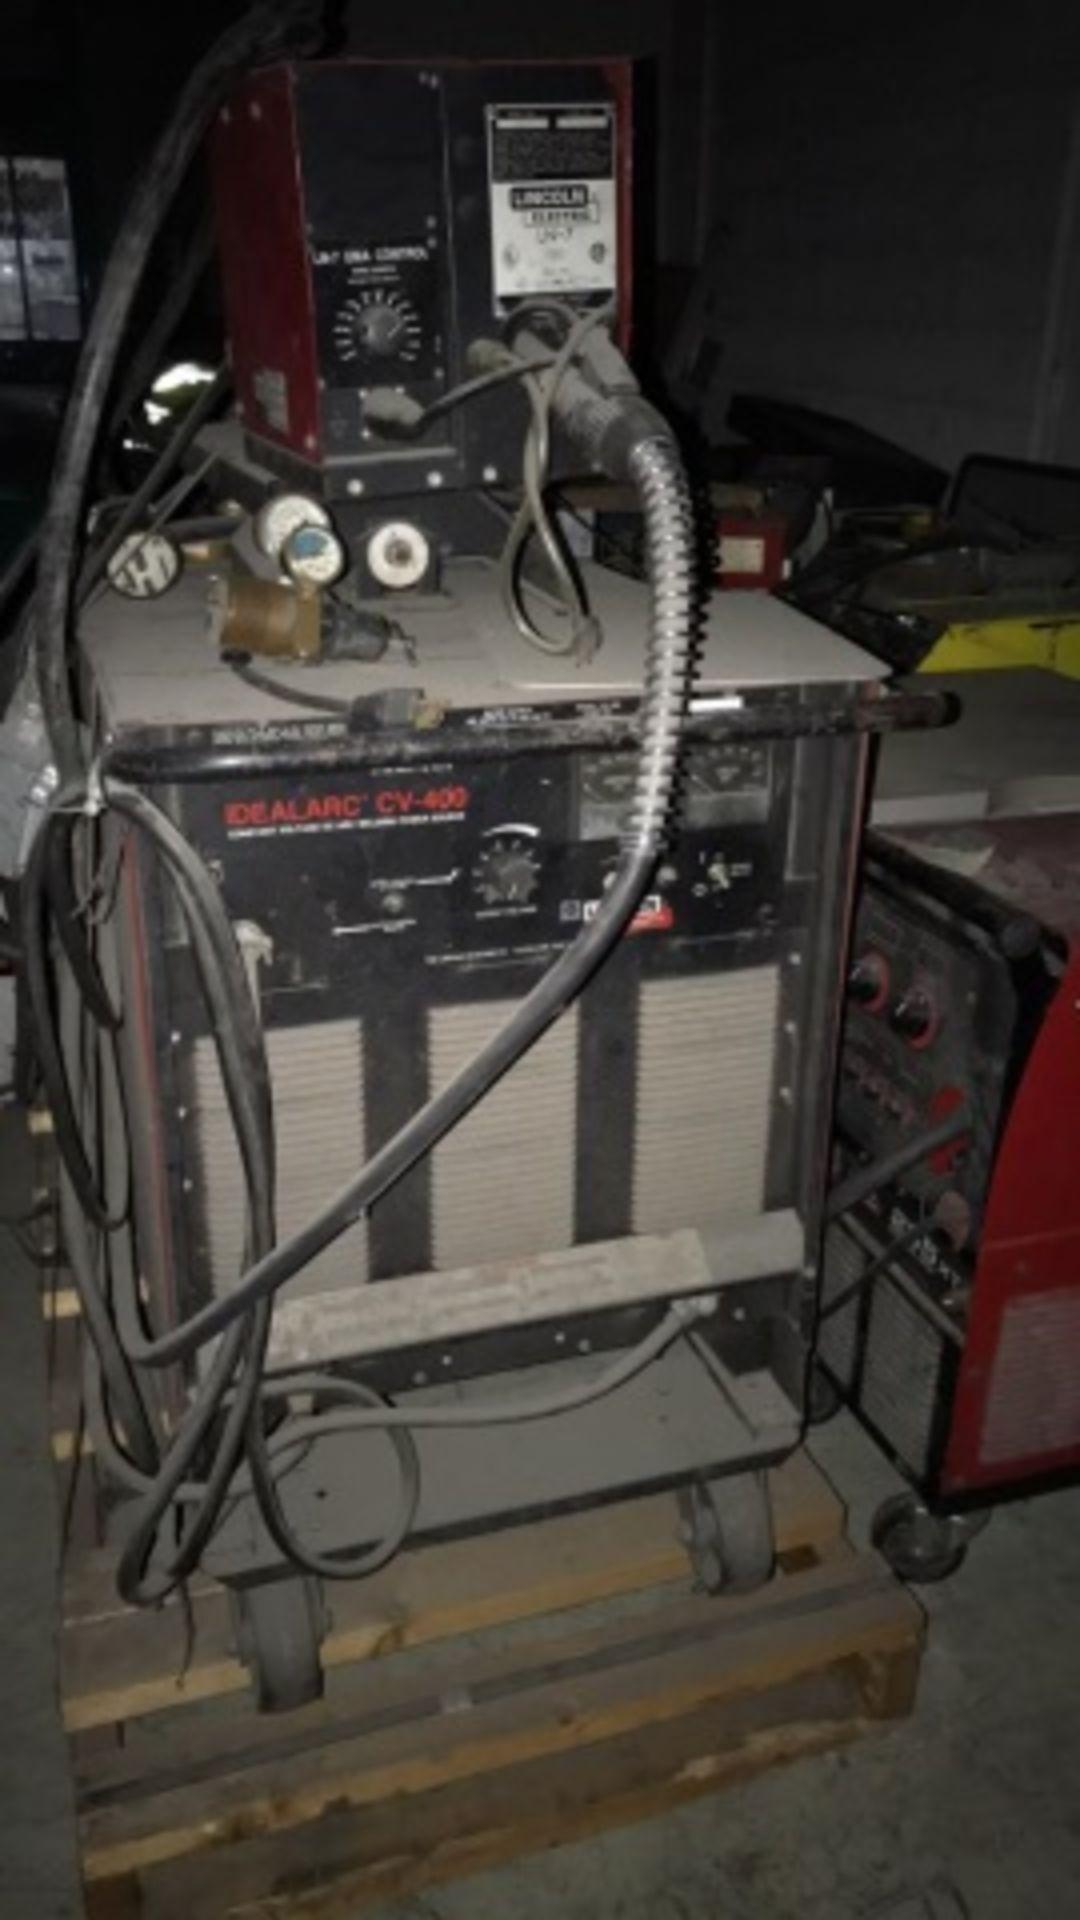 Lincoln Idealarc CV-400 DC Welding Power source